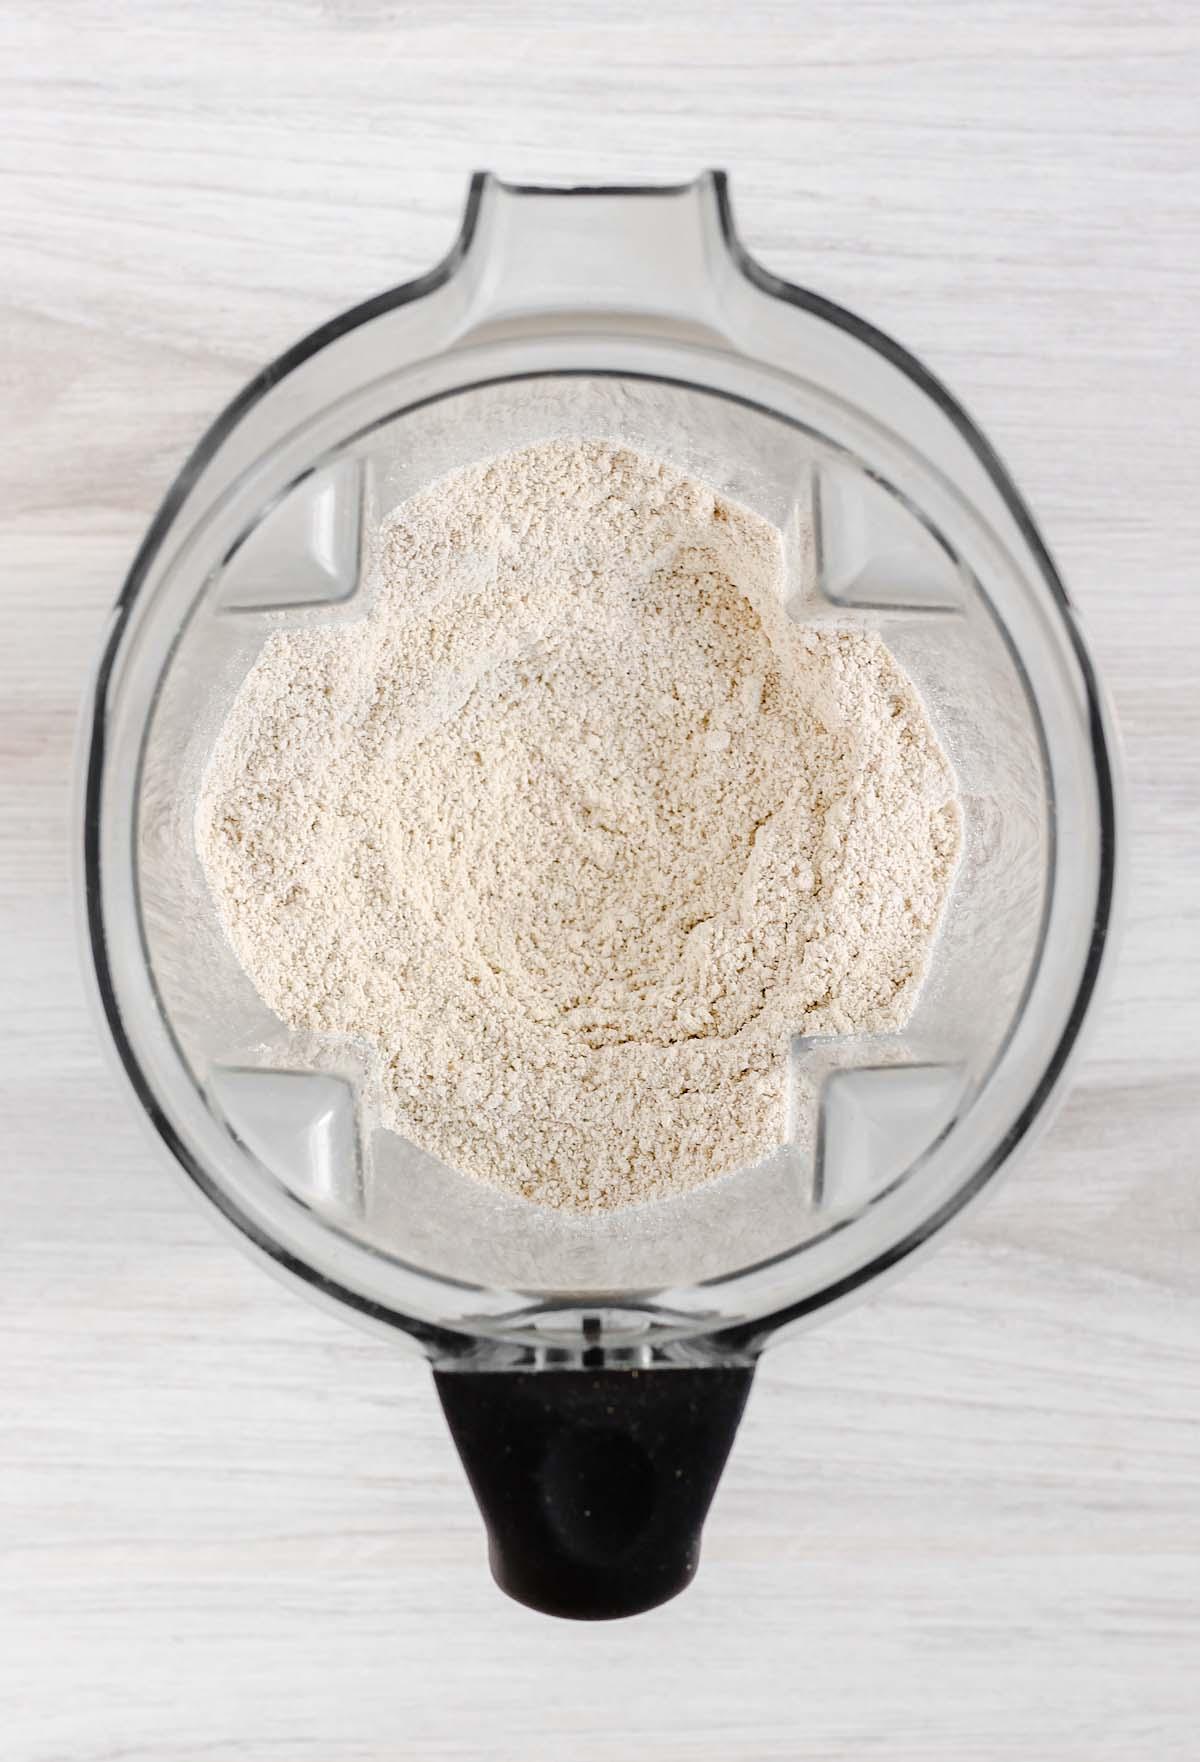 oat flour in a blender